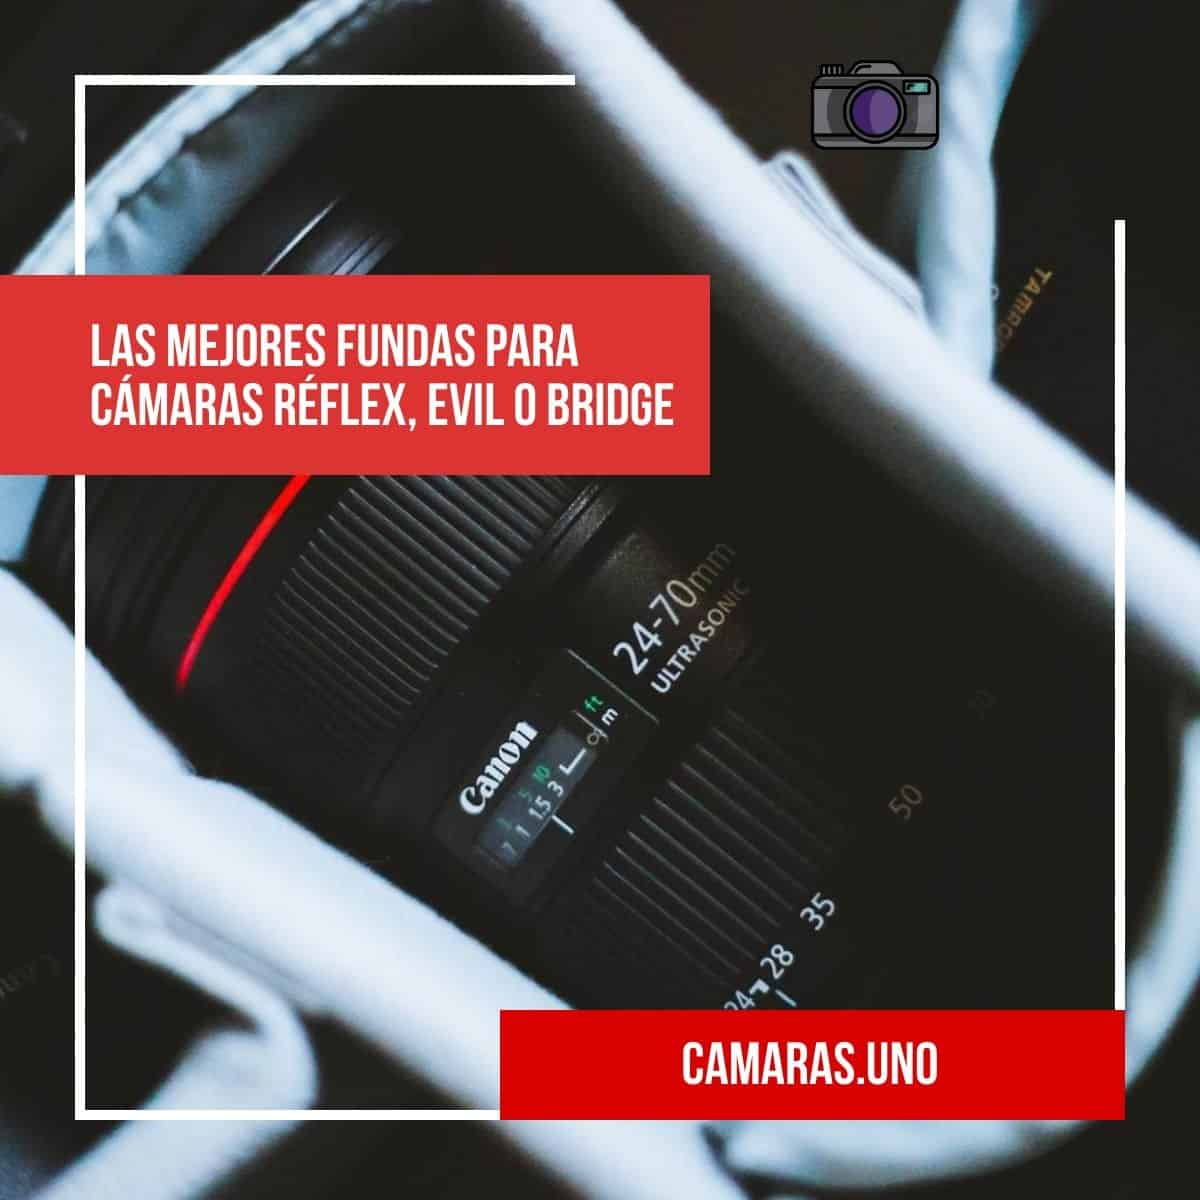 Las mejores fundas para cámaras réflex, EVIL o Bridge